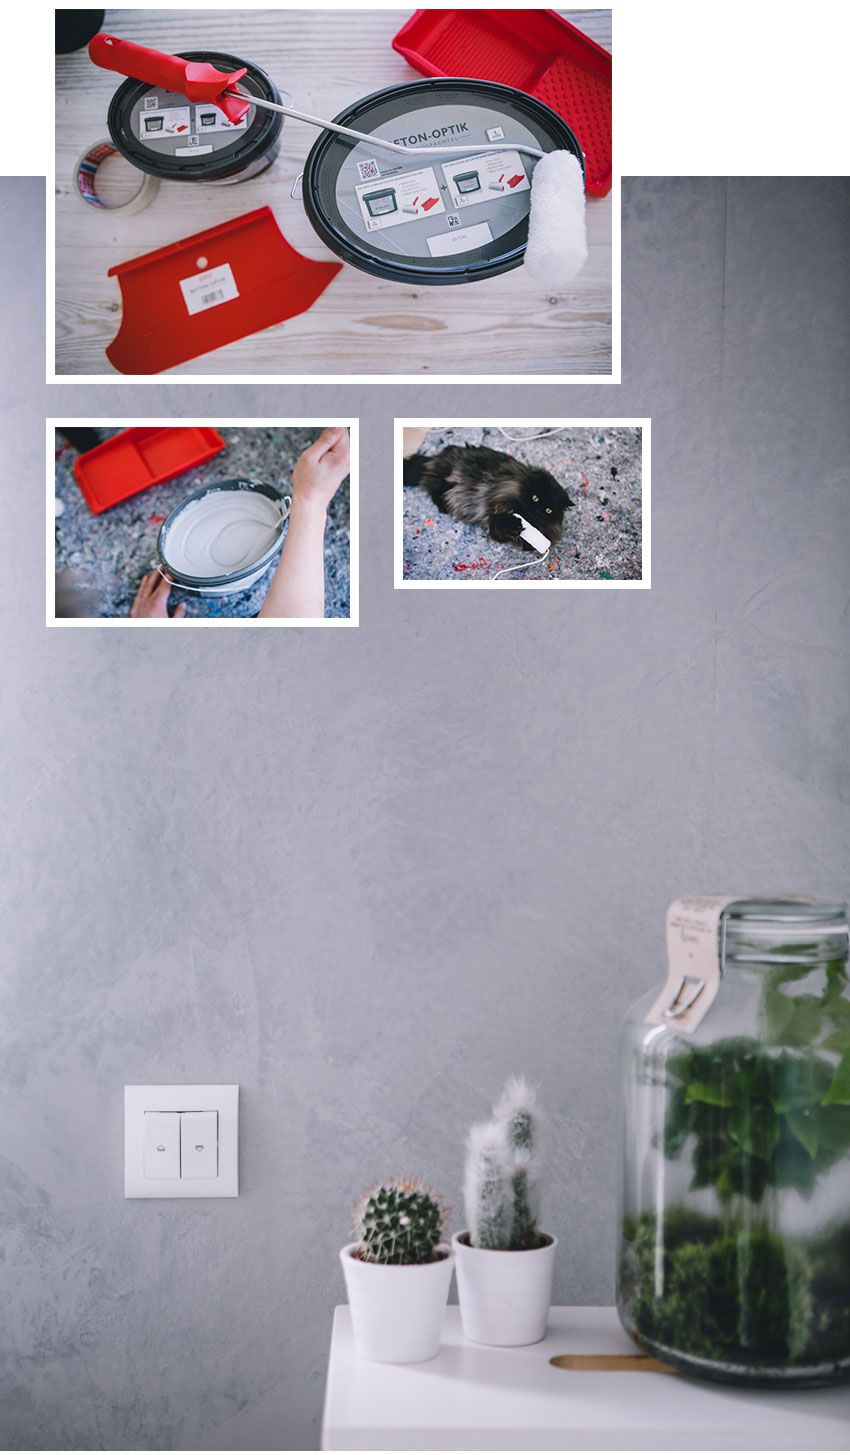 Wand In Betonoptik Selber Machen Trendstruktur Betonoptik Betonoptik Schoner Wohnen Wandfarbe Betonoptik Wand